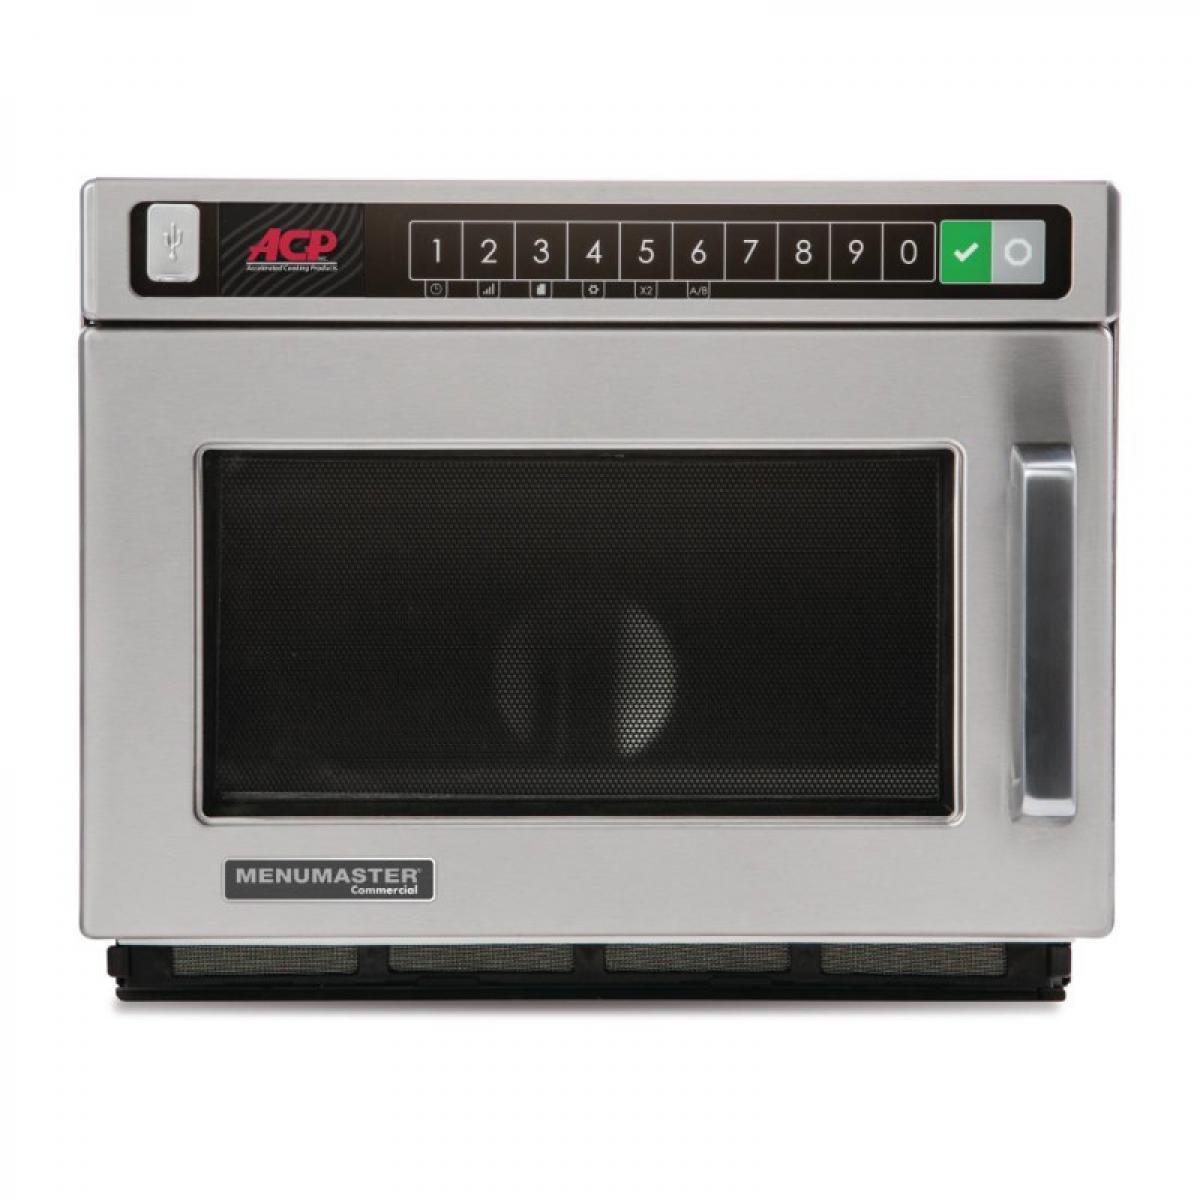 Menumaster Micro-Ondes Compact Professionnel 17 L - Puissance 1,8 kW - Menumaster - 1700 cl